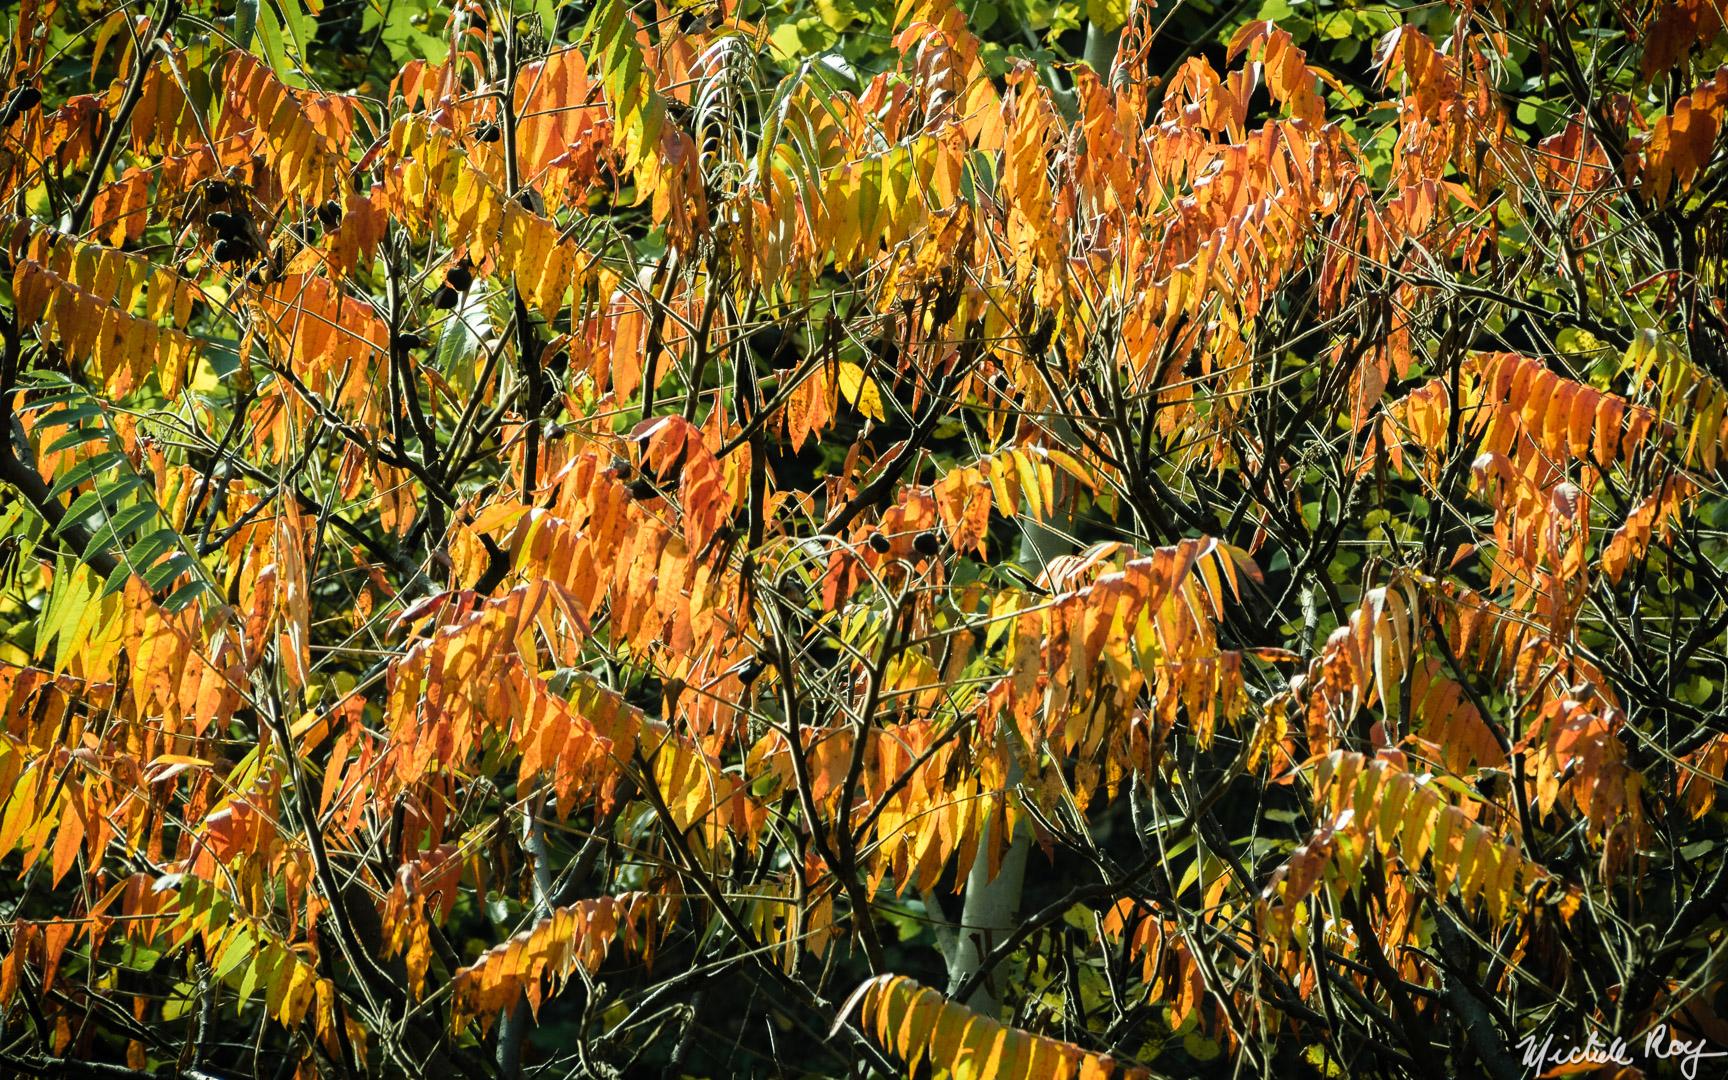 Couleurs automnales (9) / Fall colors (9)